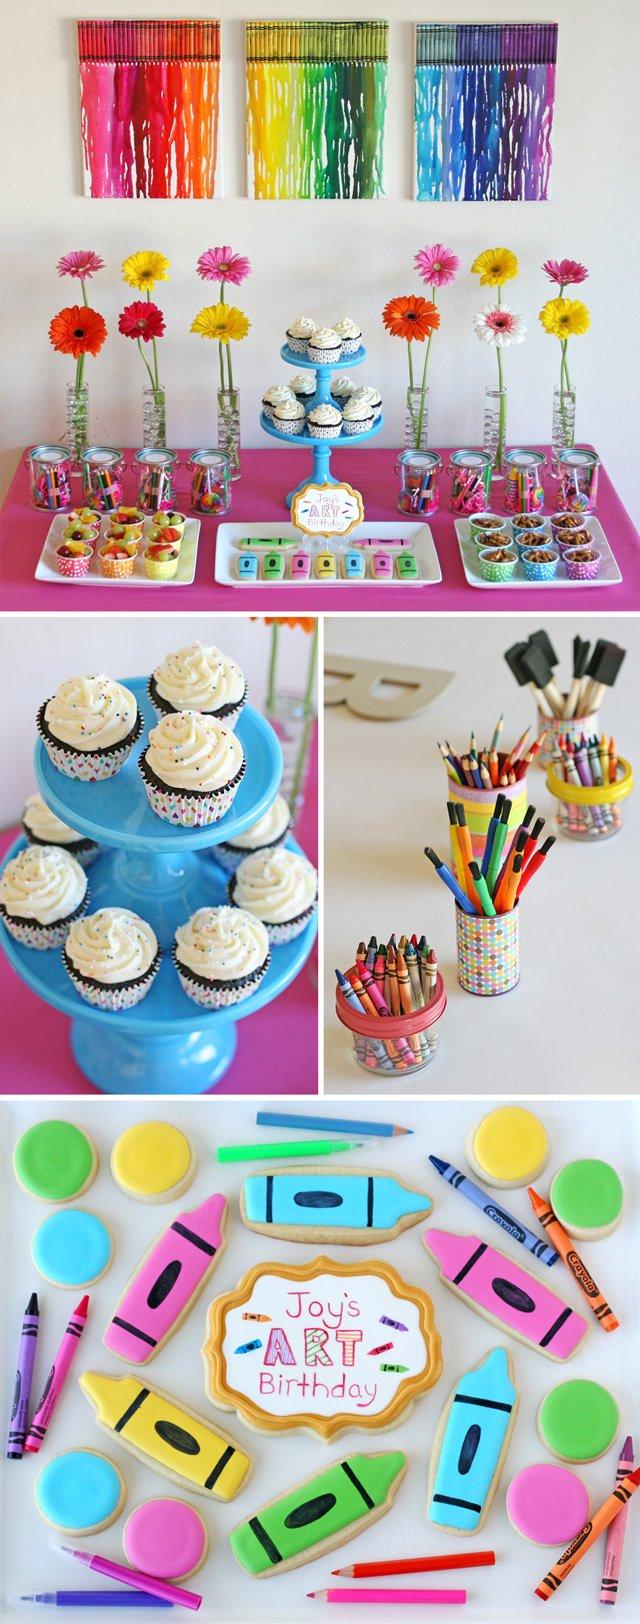 Terrific Rainbow Art Birthday Party Glorious Treats Personalised Birthday Cards Paralily Jamesorg